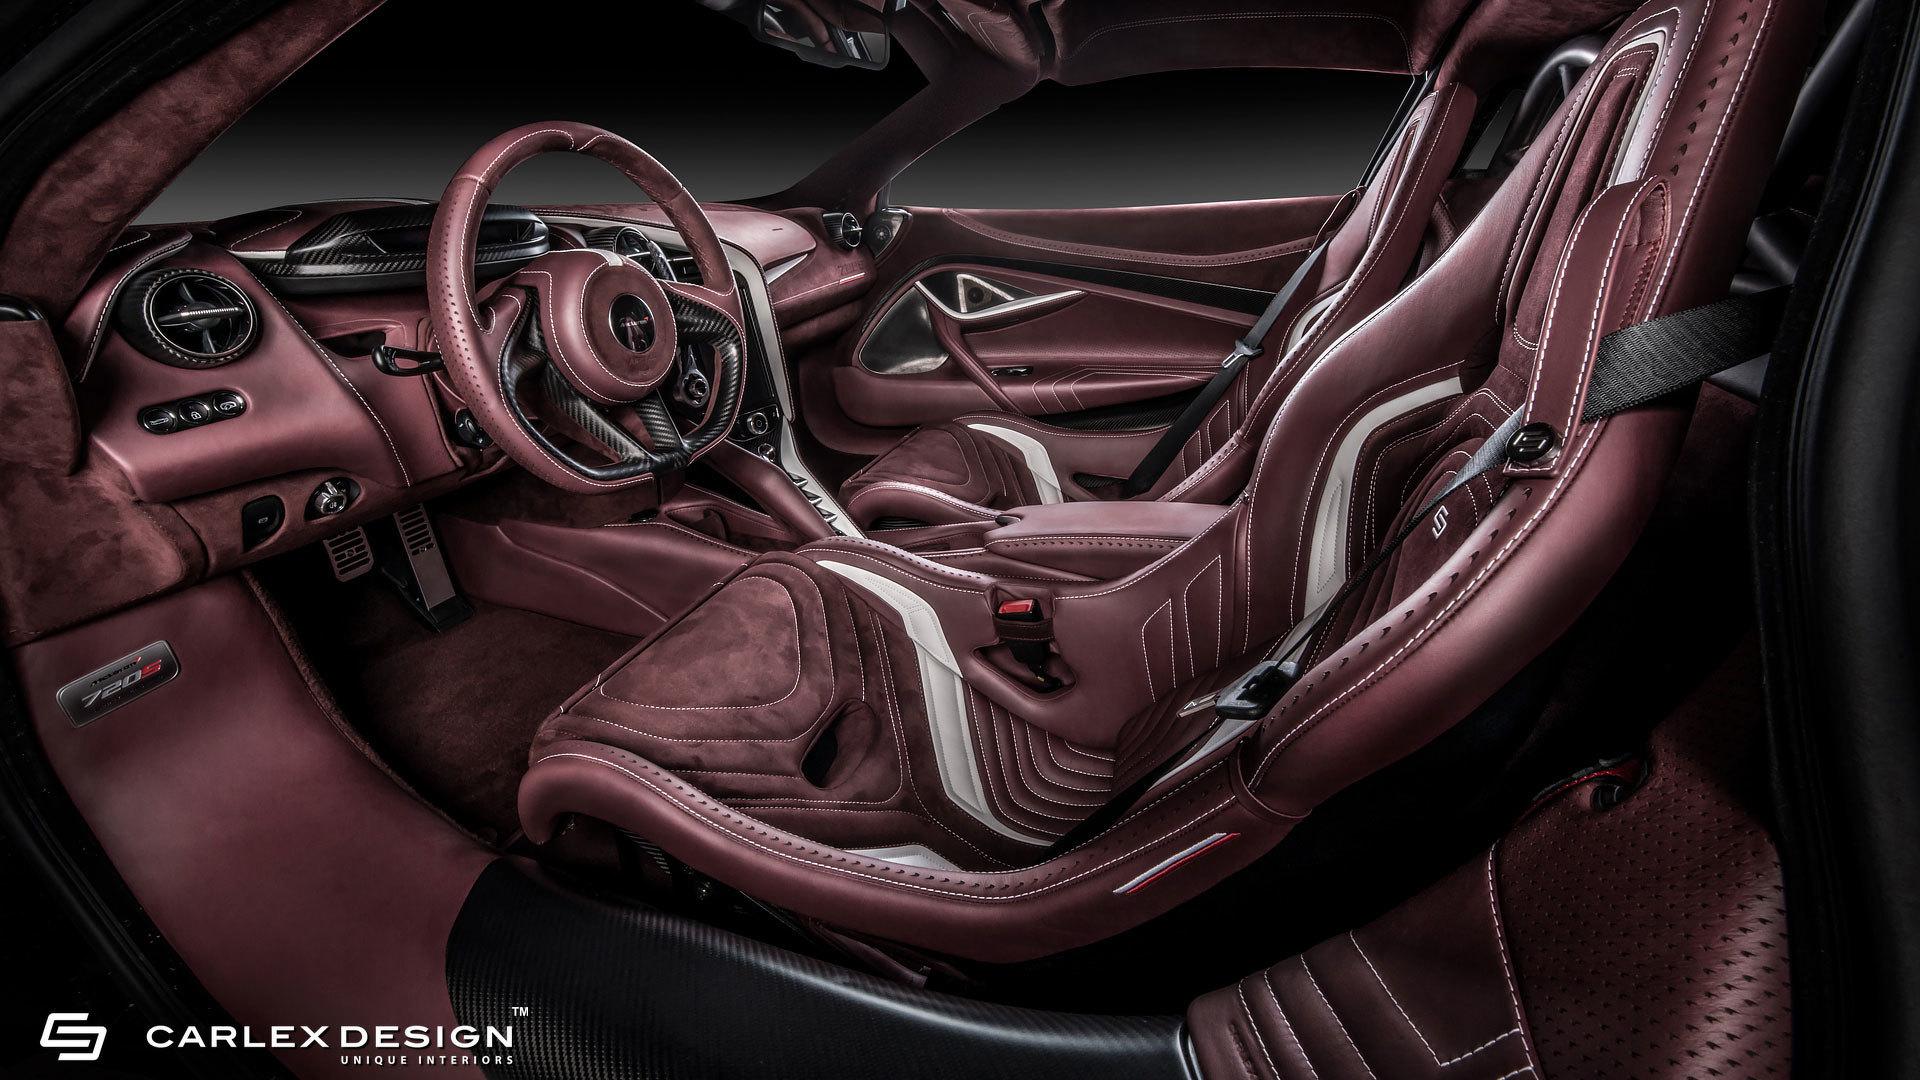 mclaren-720s-by-carlex-design (11)